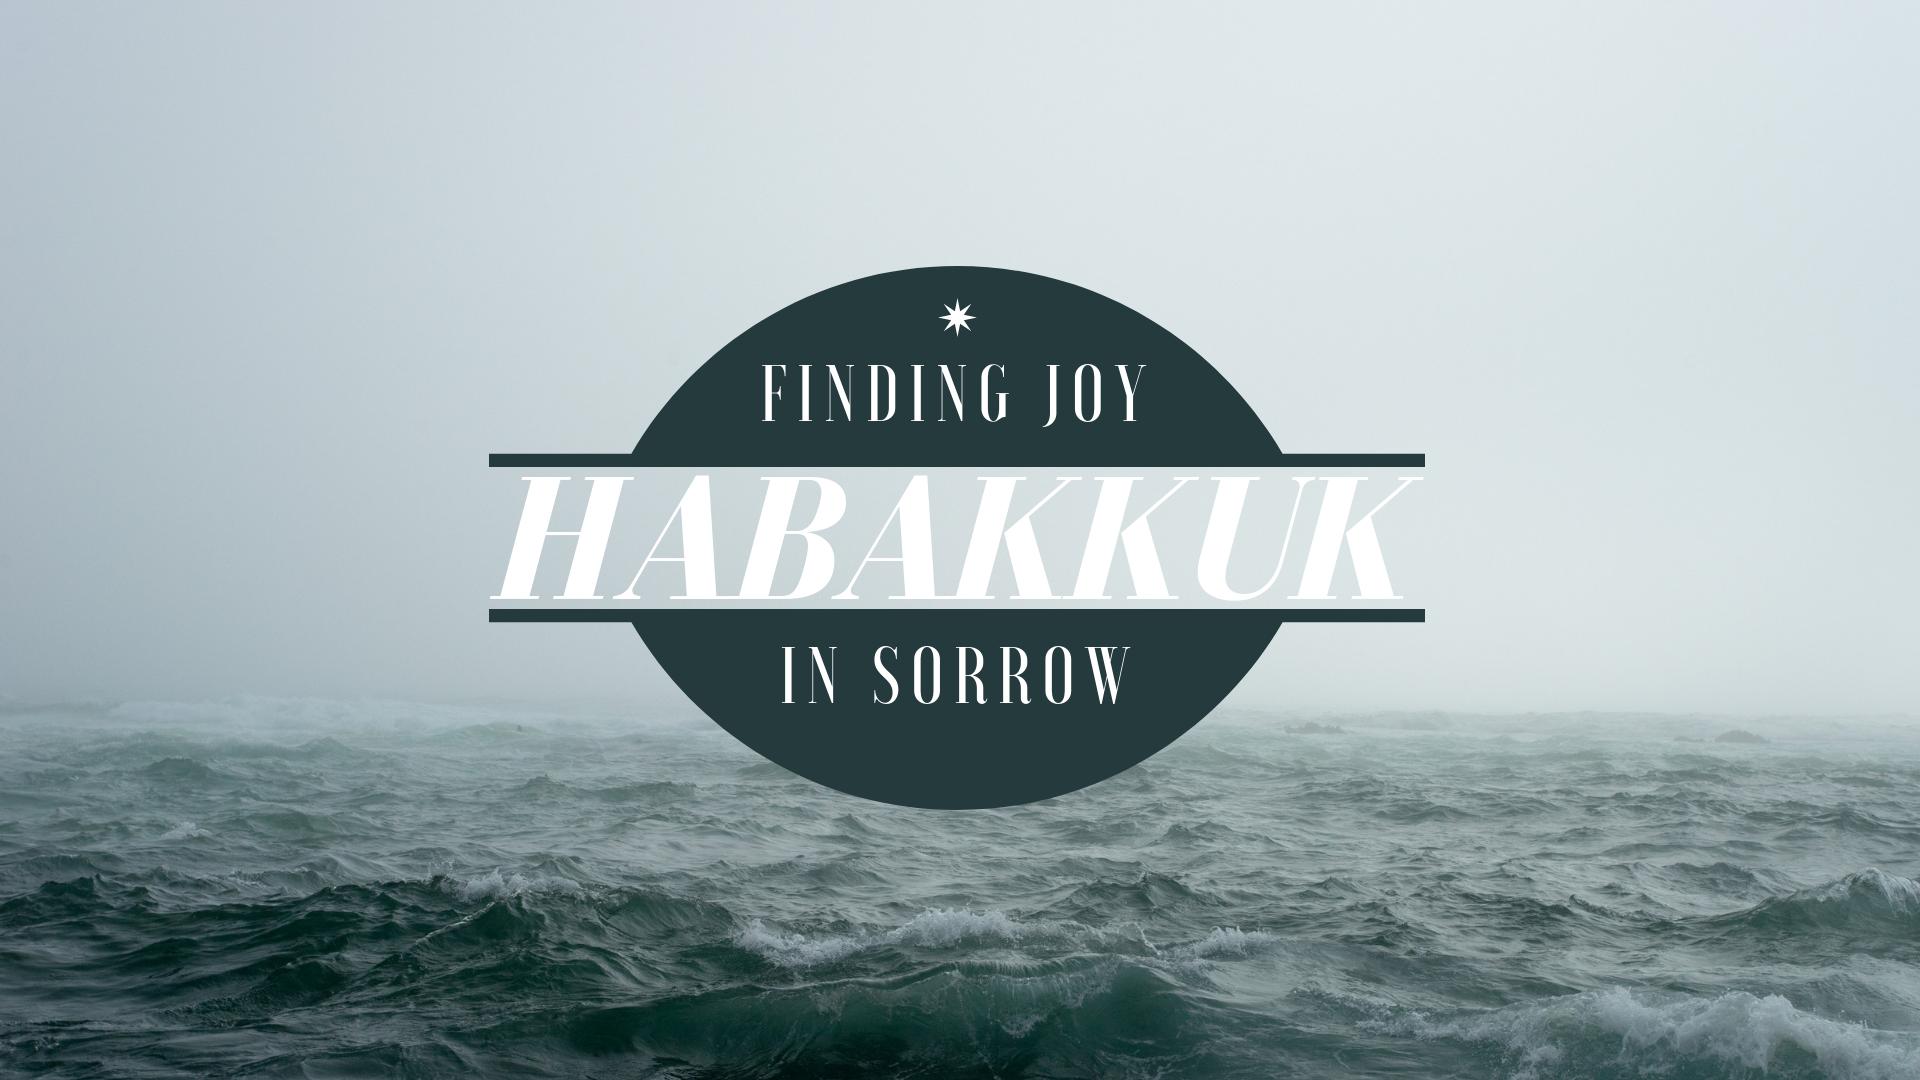 Habakkuk Full Design 2.png